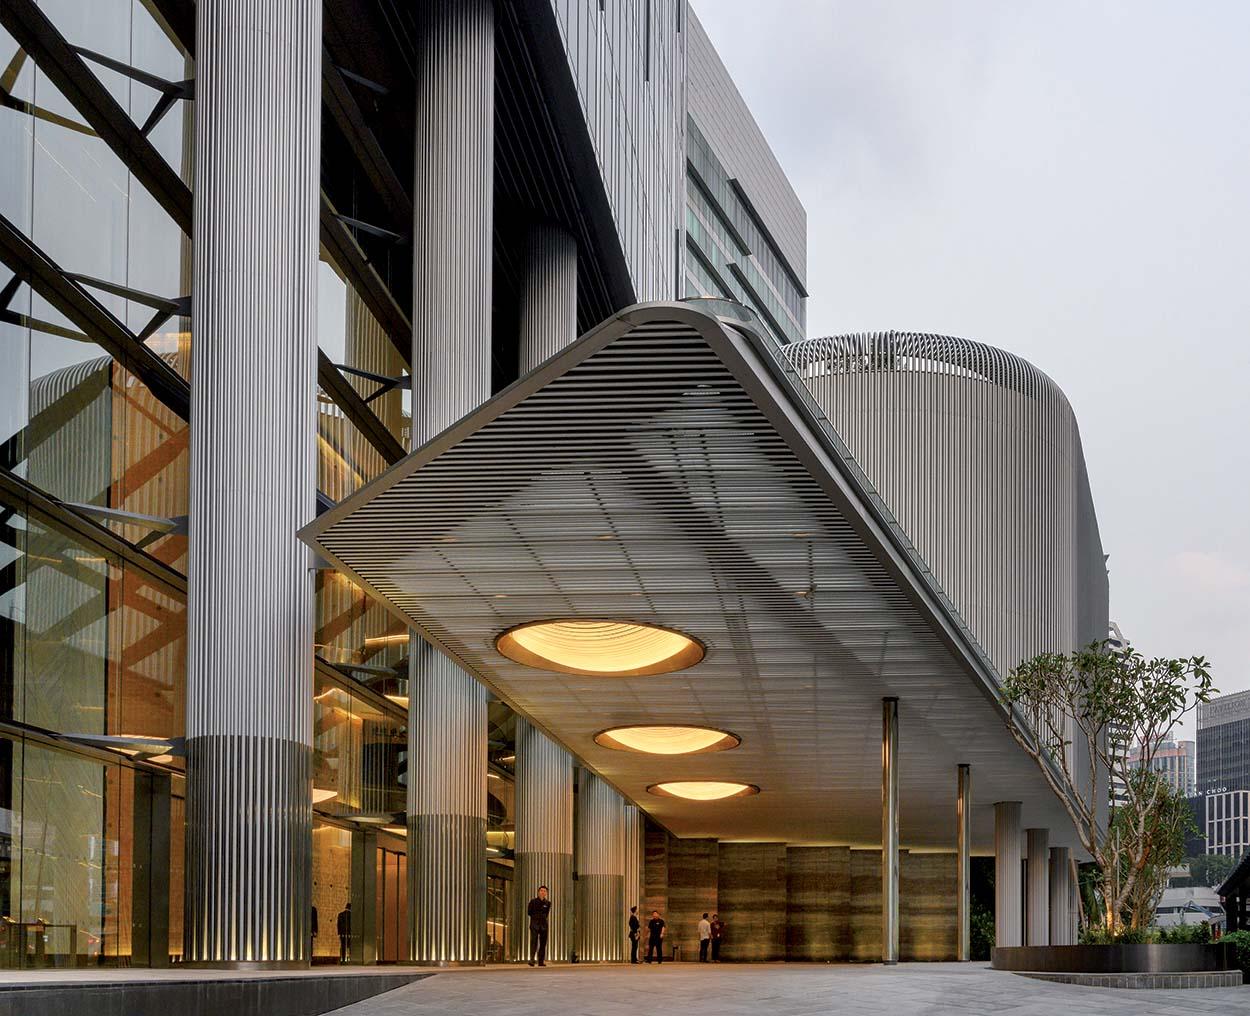 Progetti Mapei in Malesia_Equatorial Plaza - Kuala Lumpur (2)